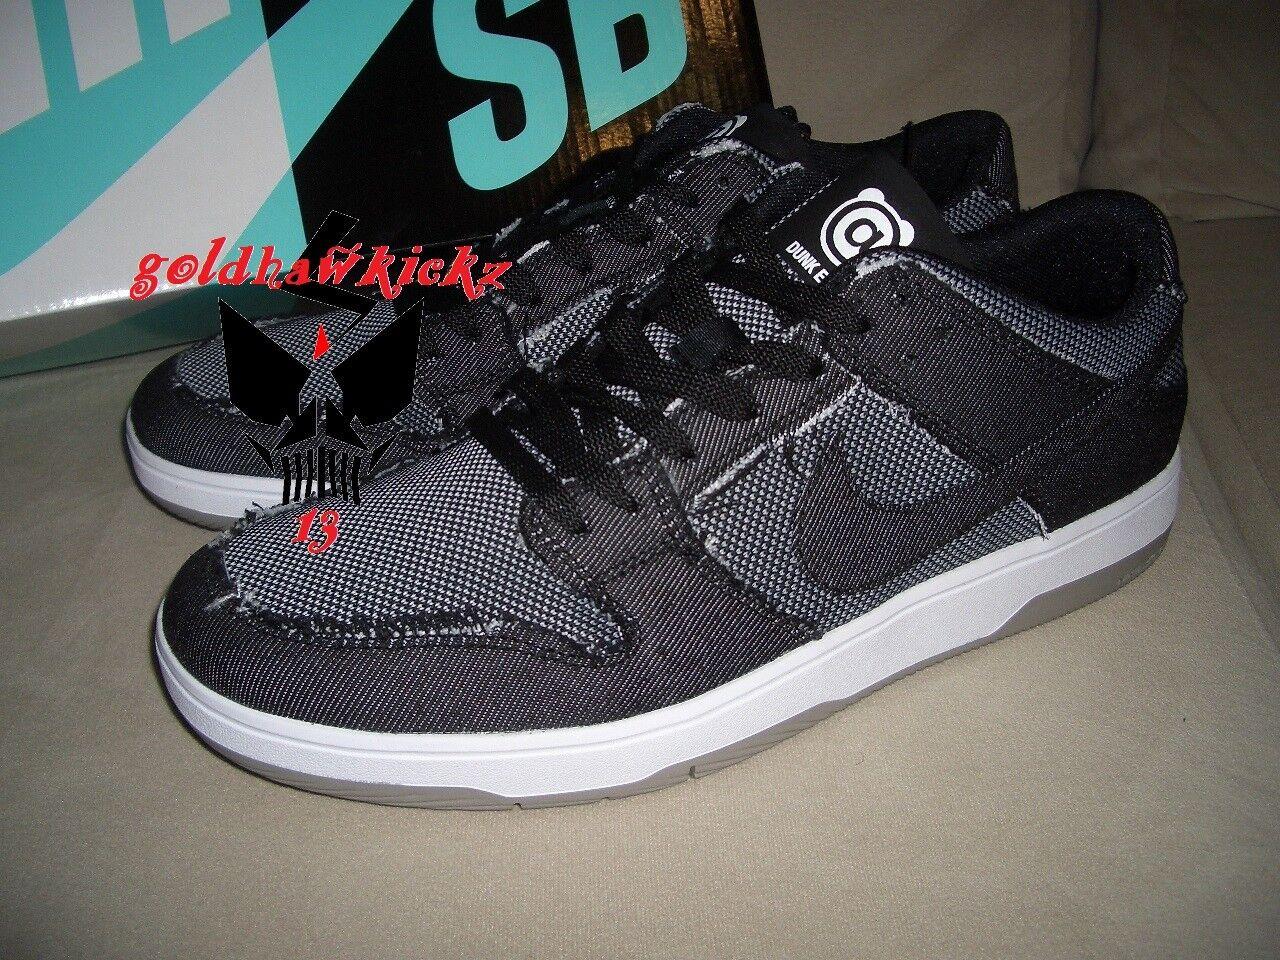 Nike Sb Zoom Dunk Low Elite Qs Medicom Toy Bearbrick Denim 877063 002 Be@rbrick